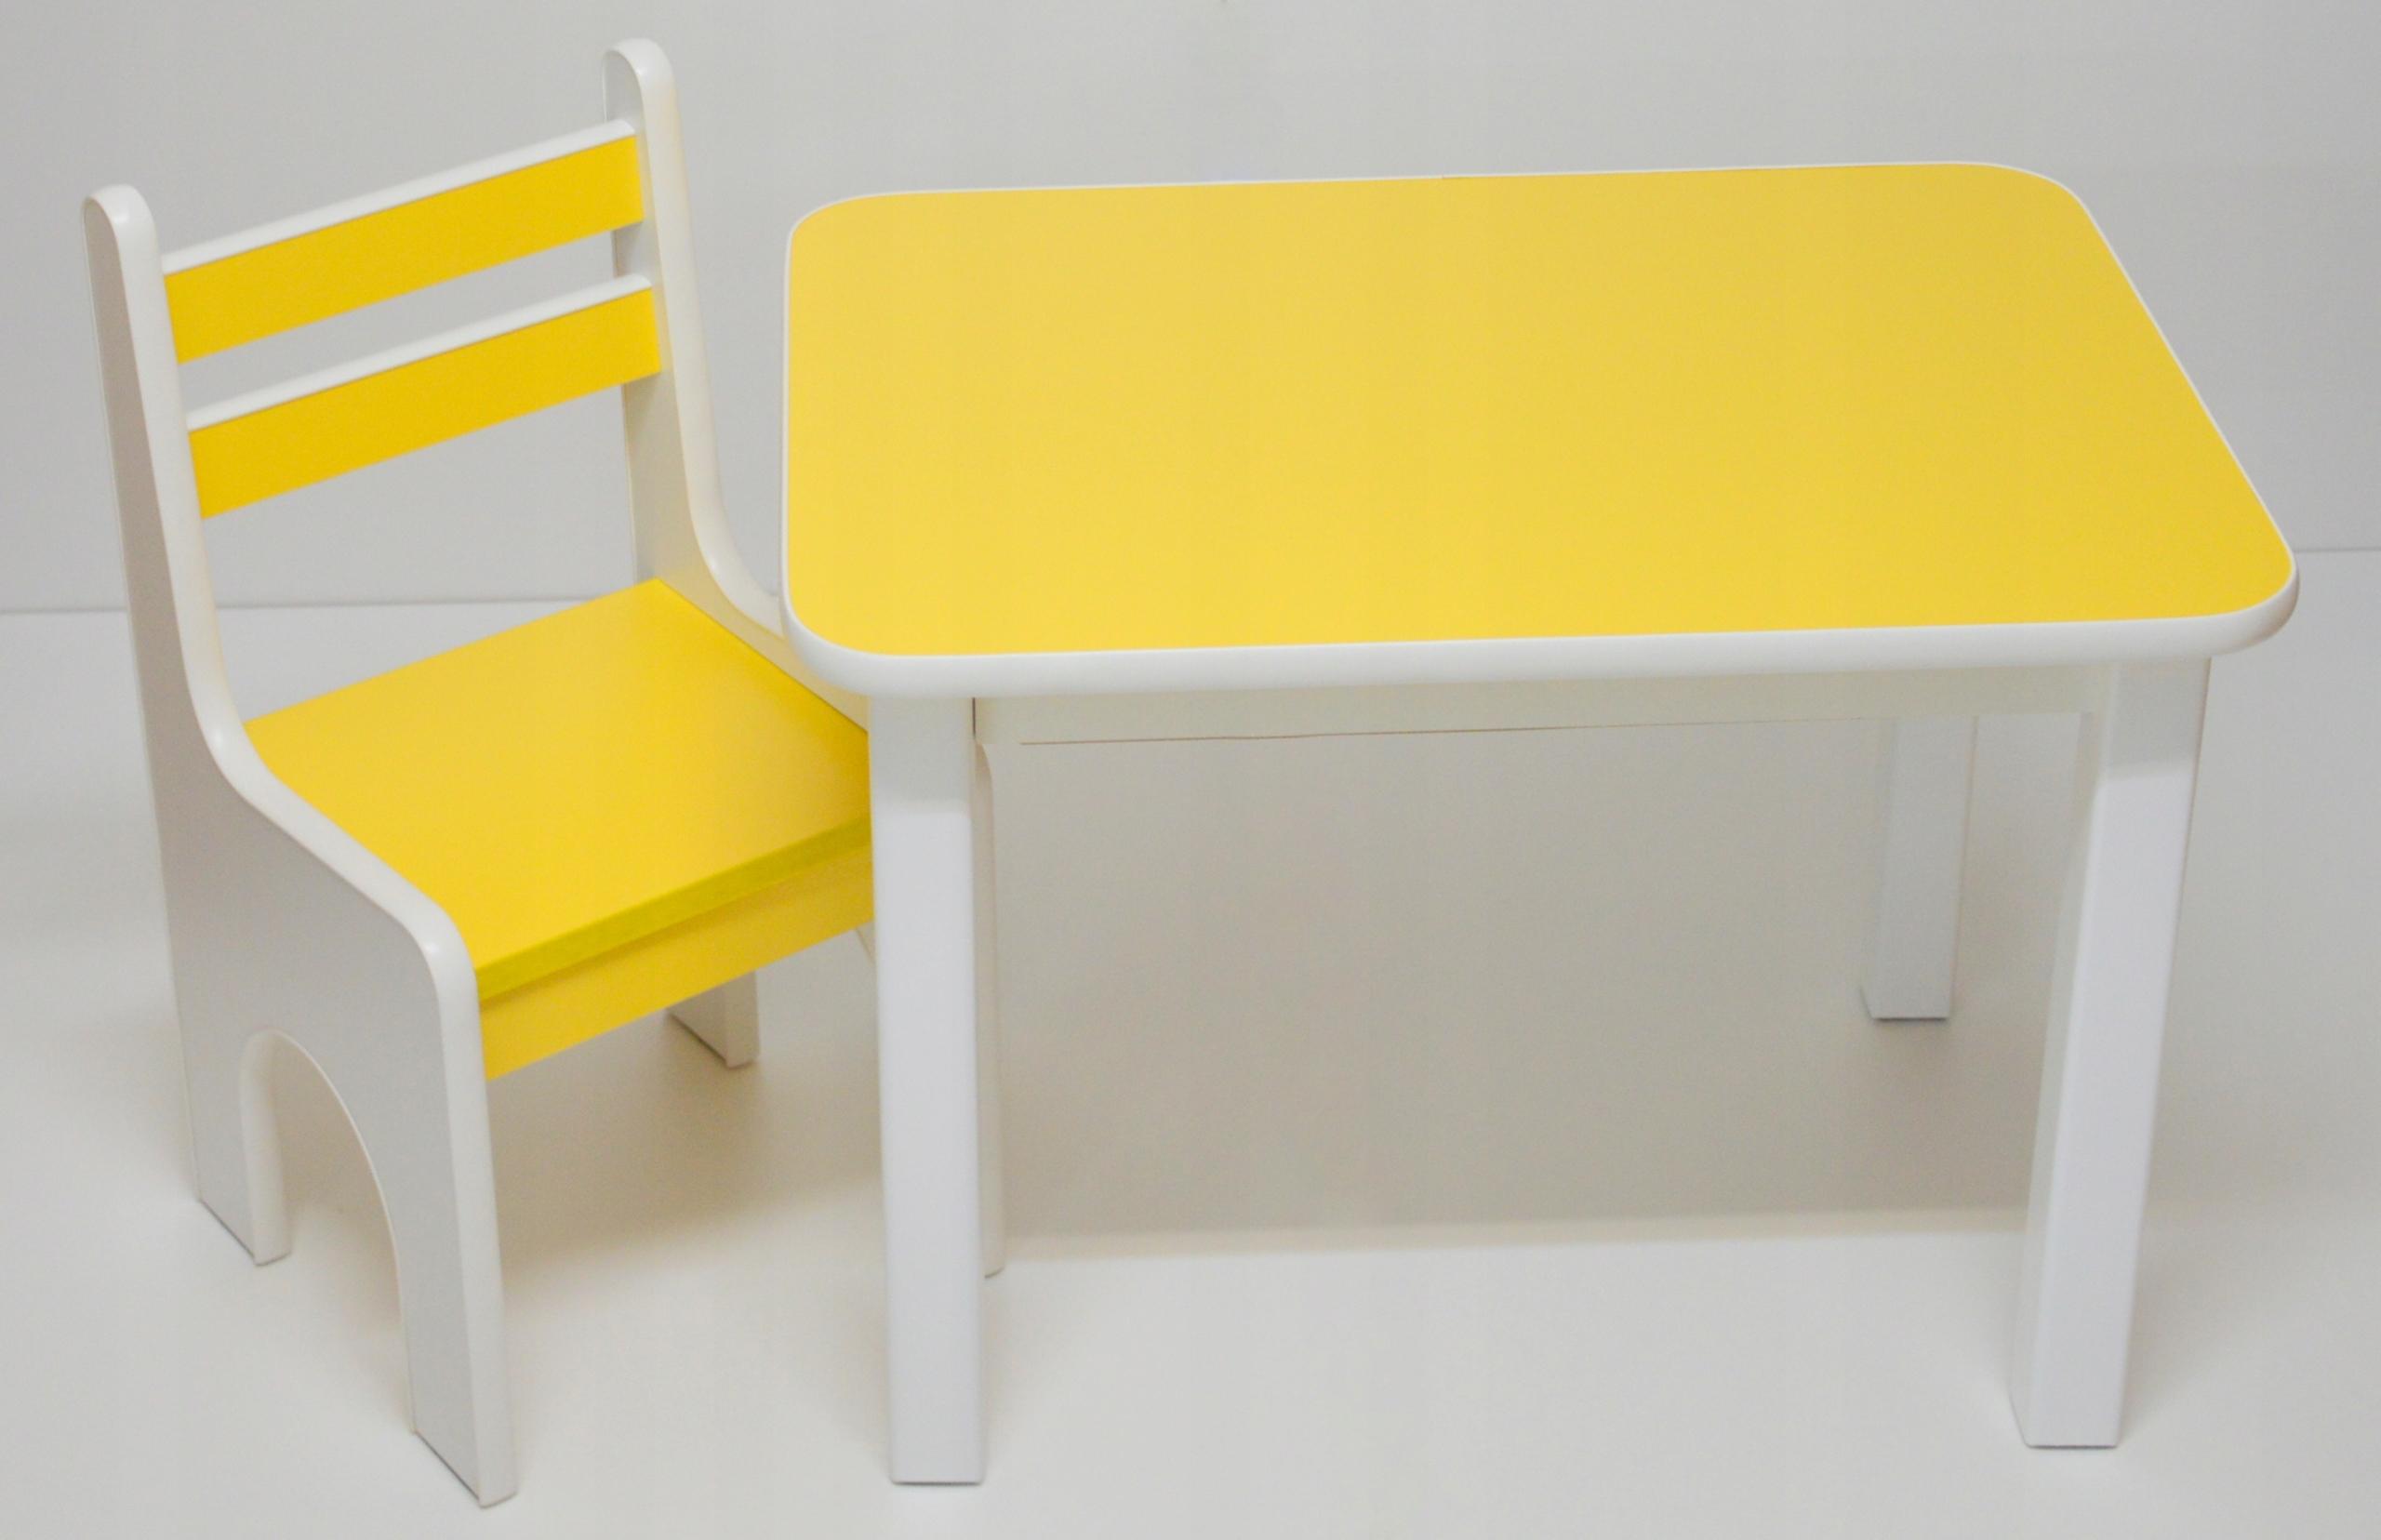 Stôl a jedna stolička silné a stabilné pre deti